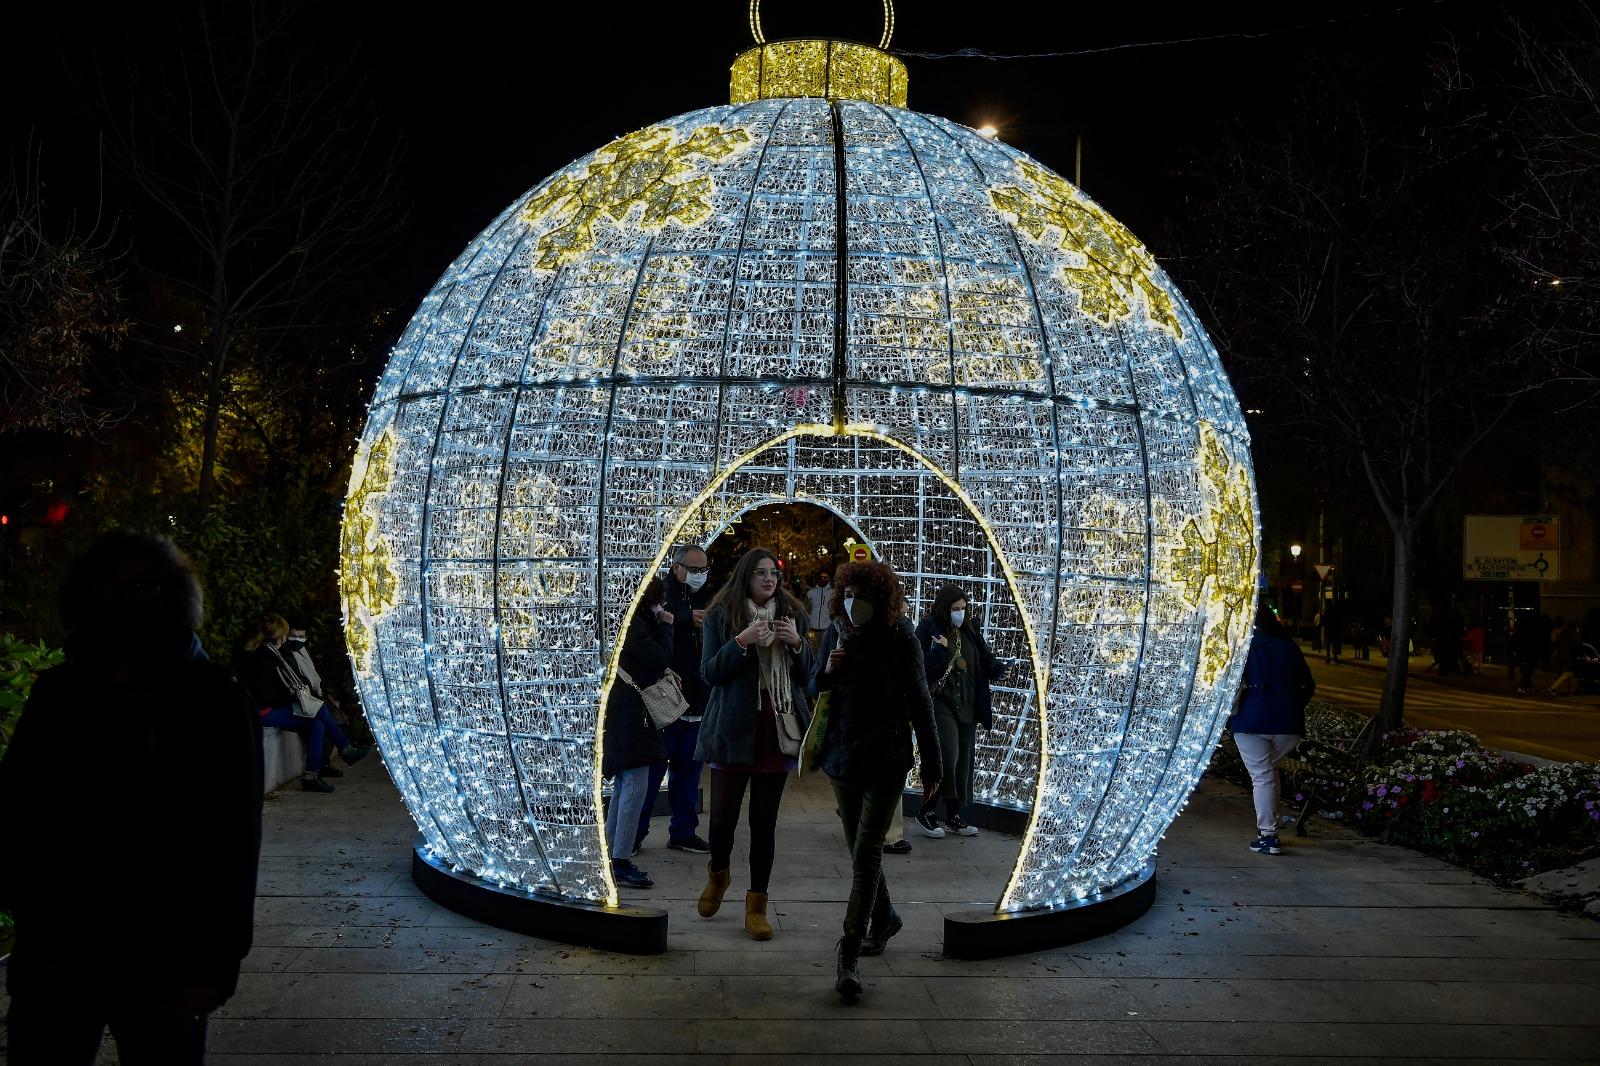 bola-navidad-luces